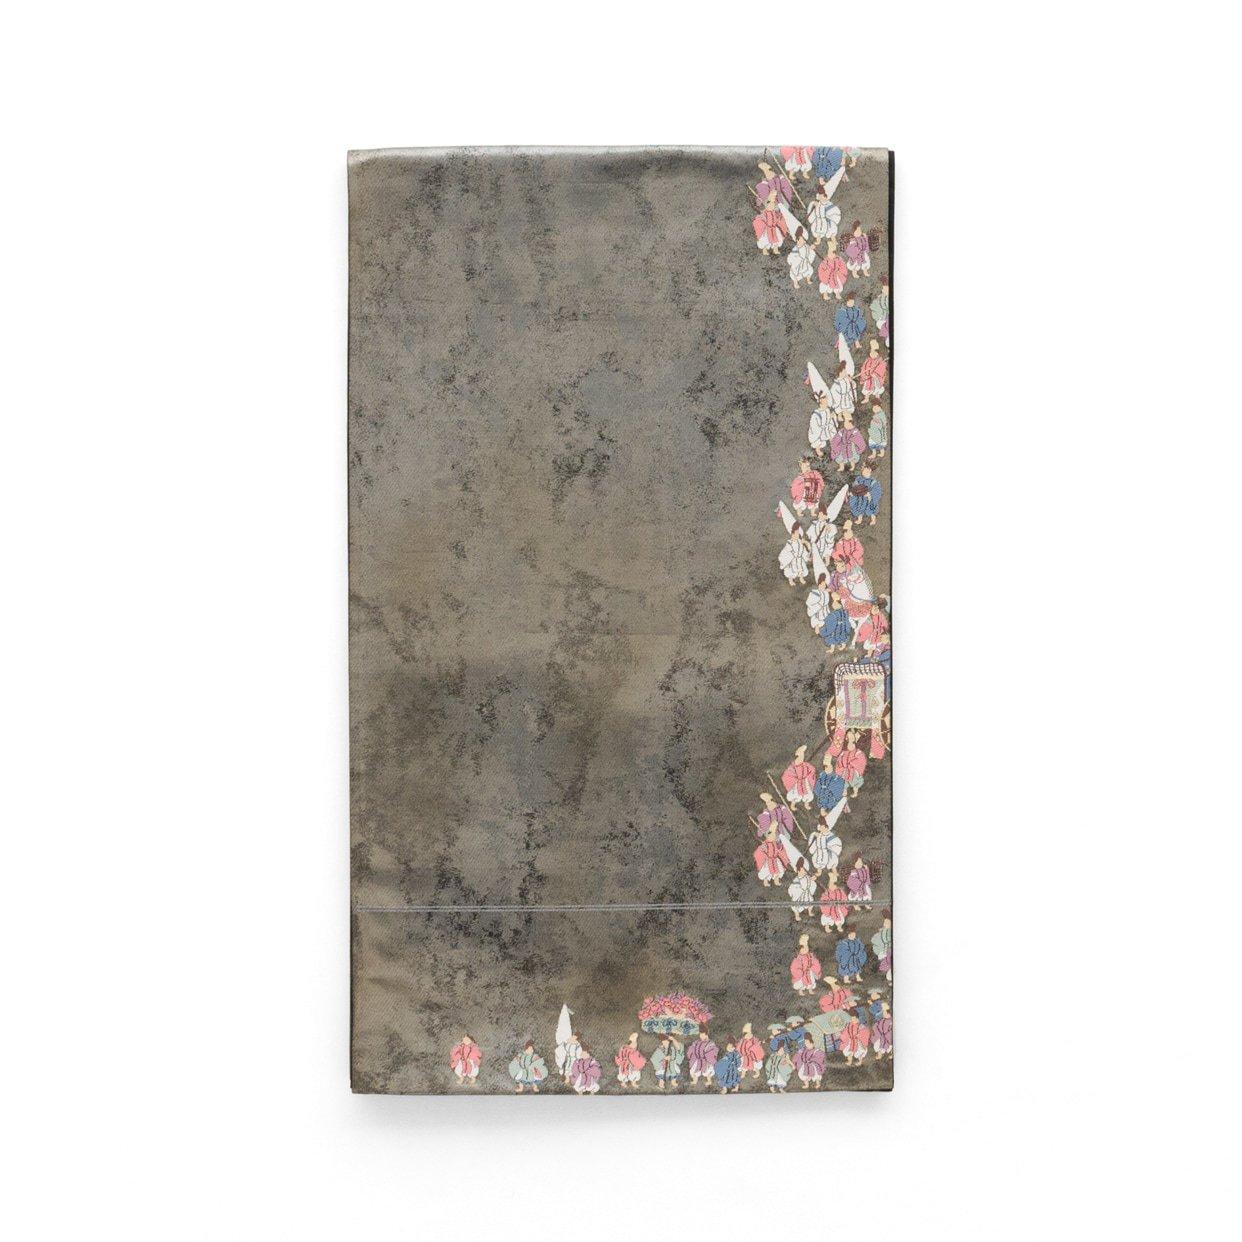 「袋帯●葵祭図」の商品画像